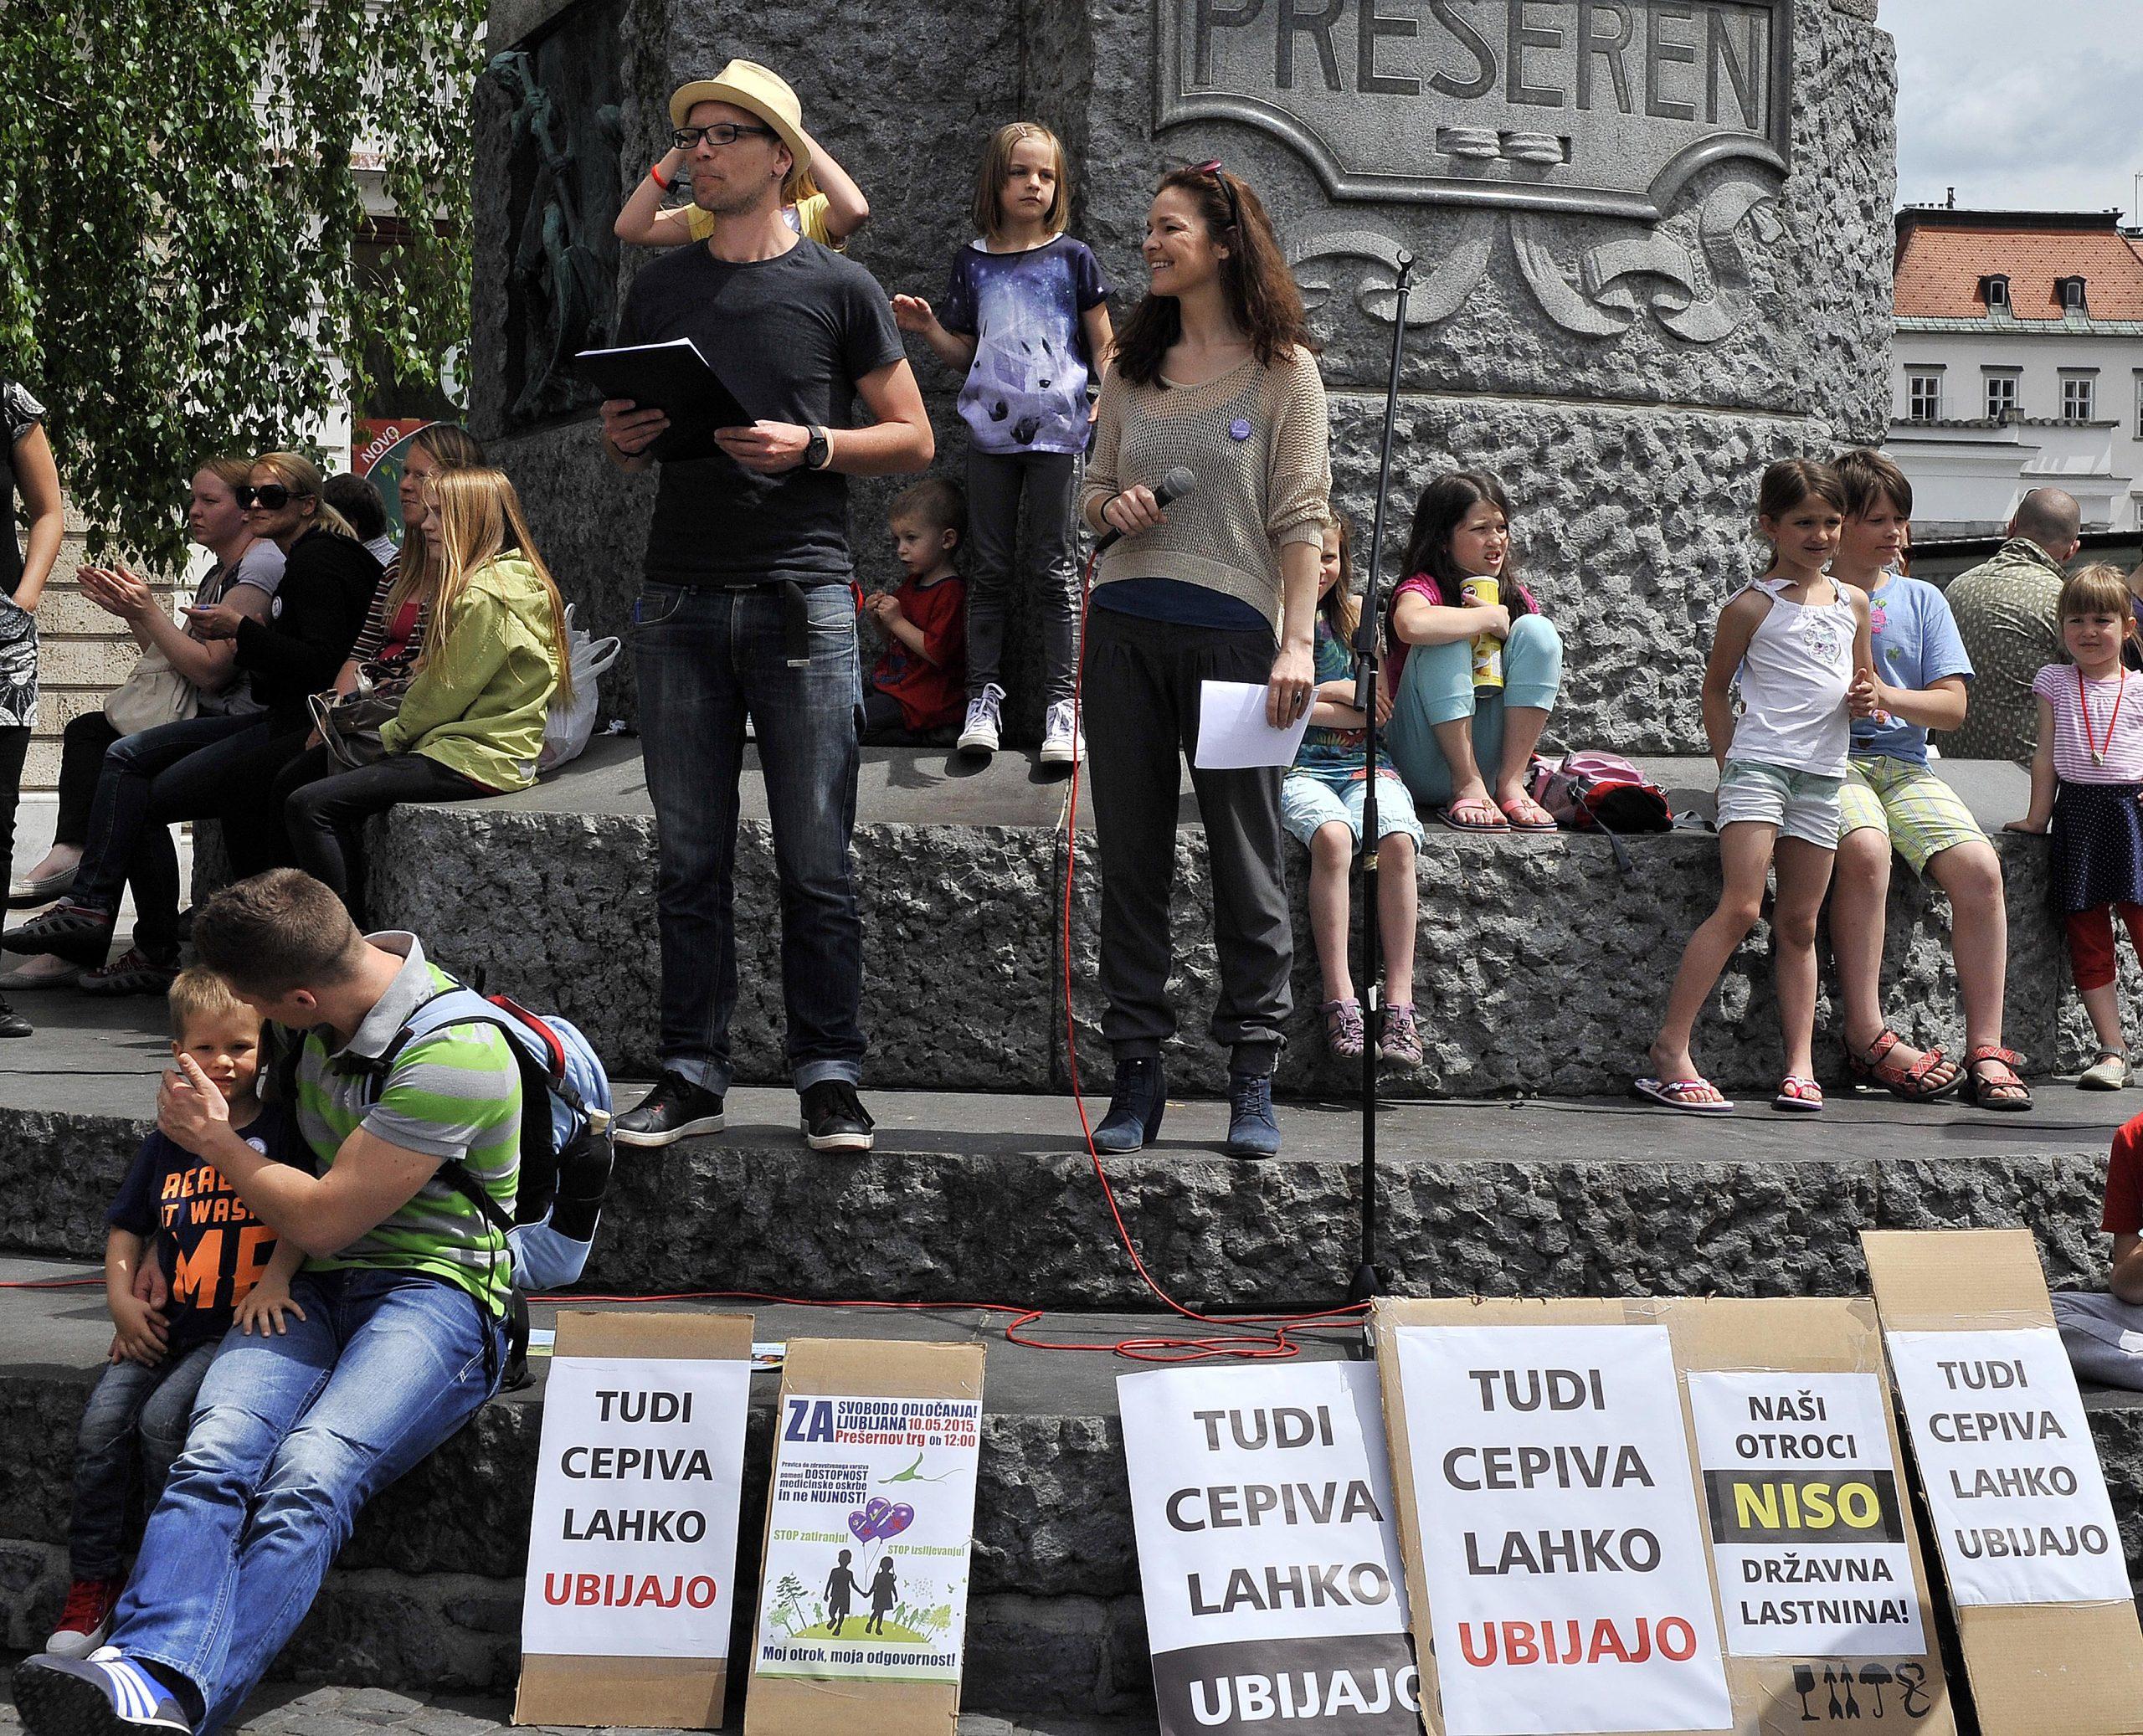 Protest cepljenje